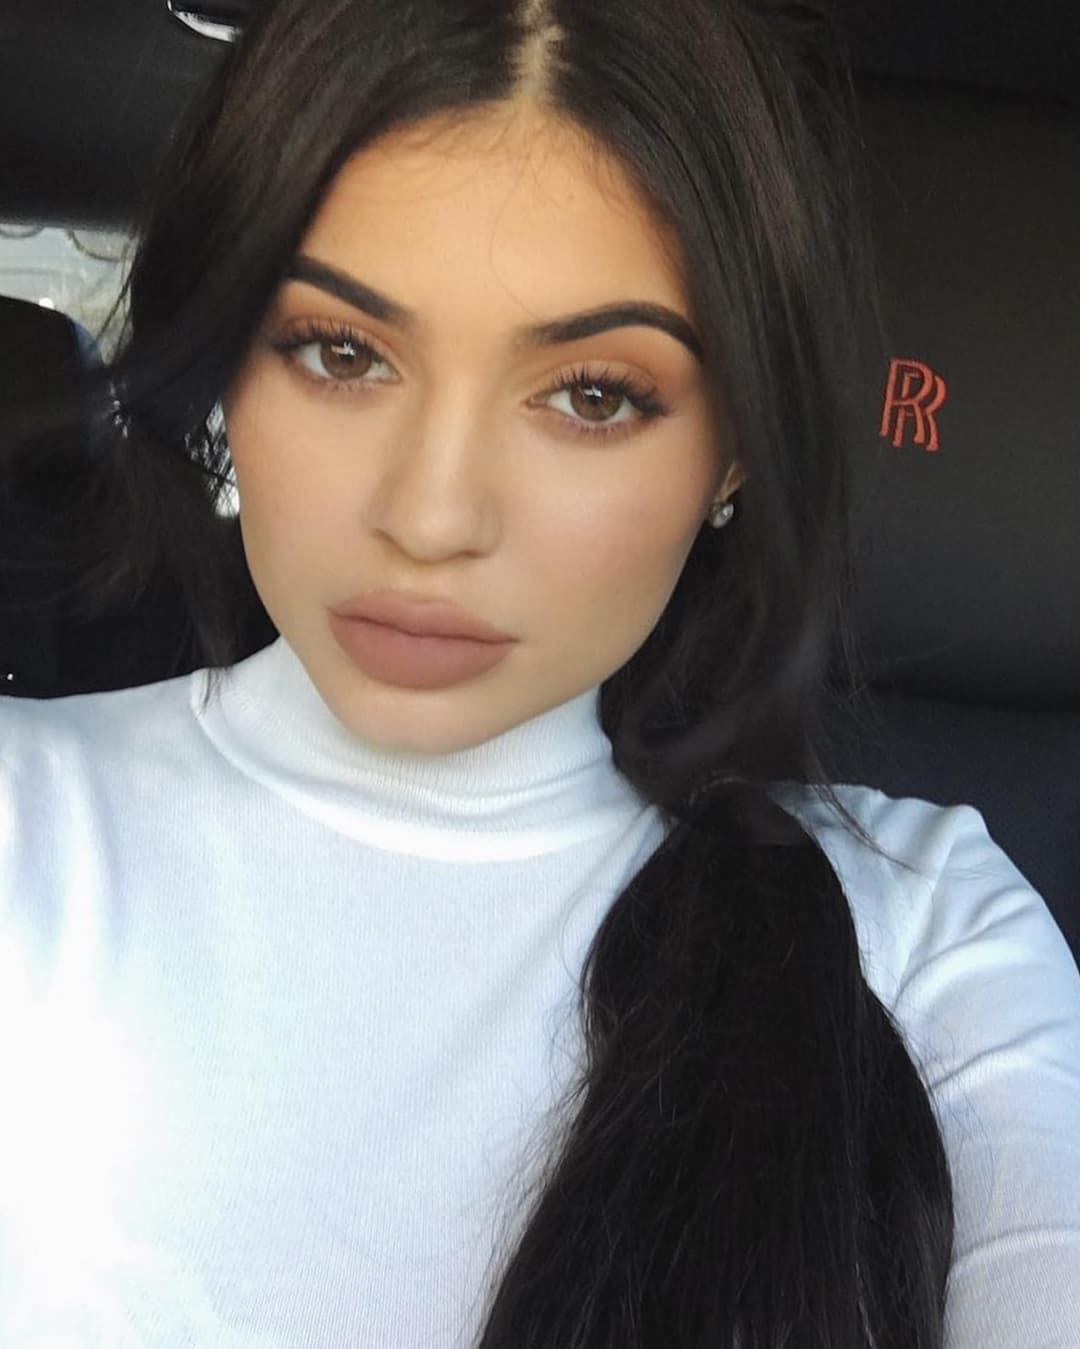 Kylie je veliki uzor ćerke Đoleta i Slađe (foto: Instagram)